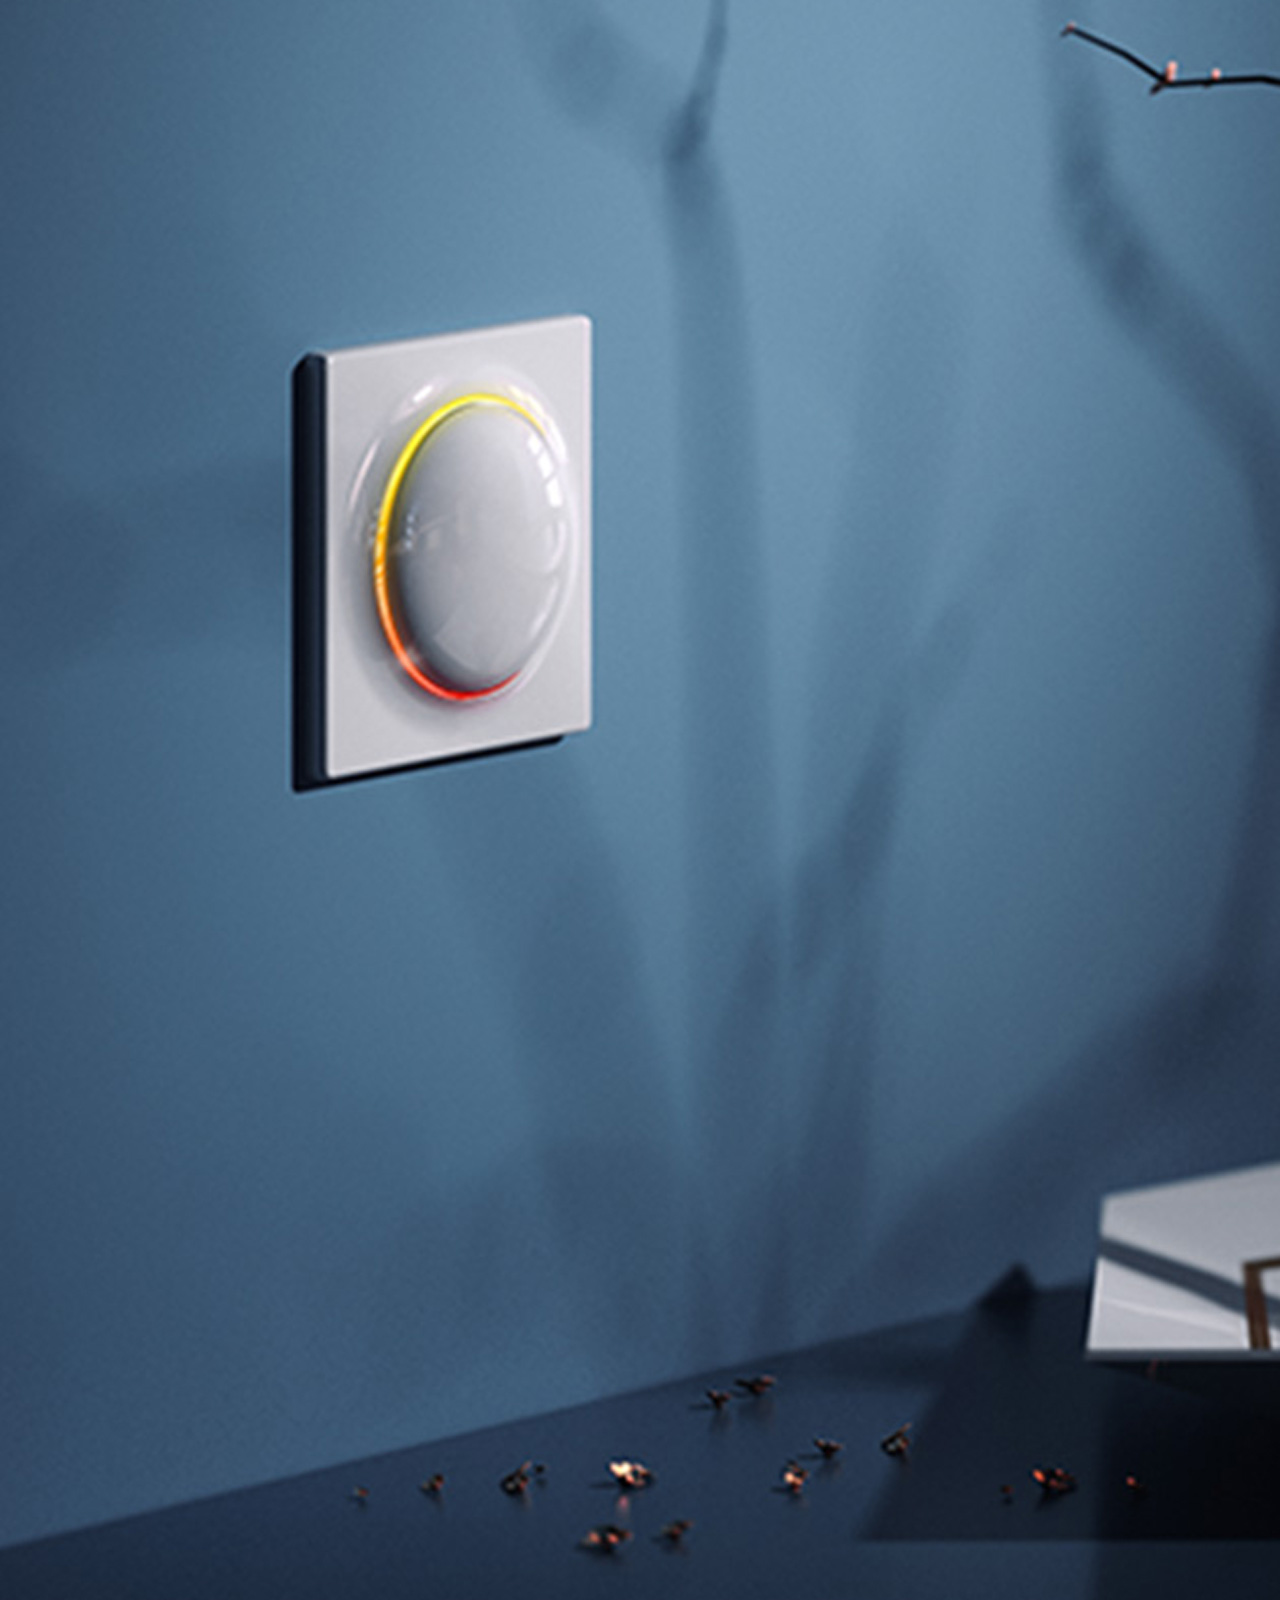 fibaro-single-cover-plate-home-wall